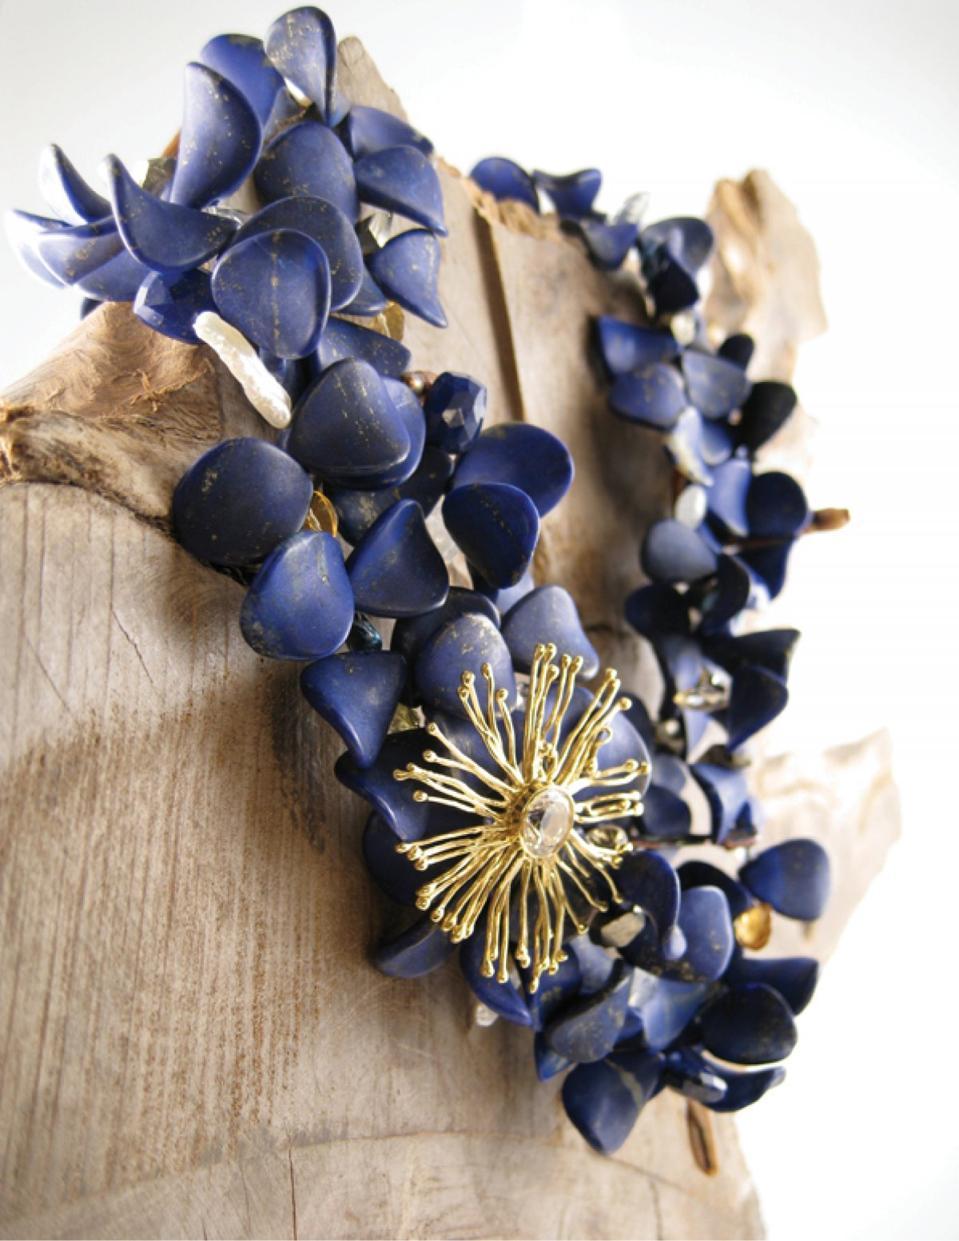 Lapis lazuli necklace designed by Joan Hornig